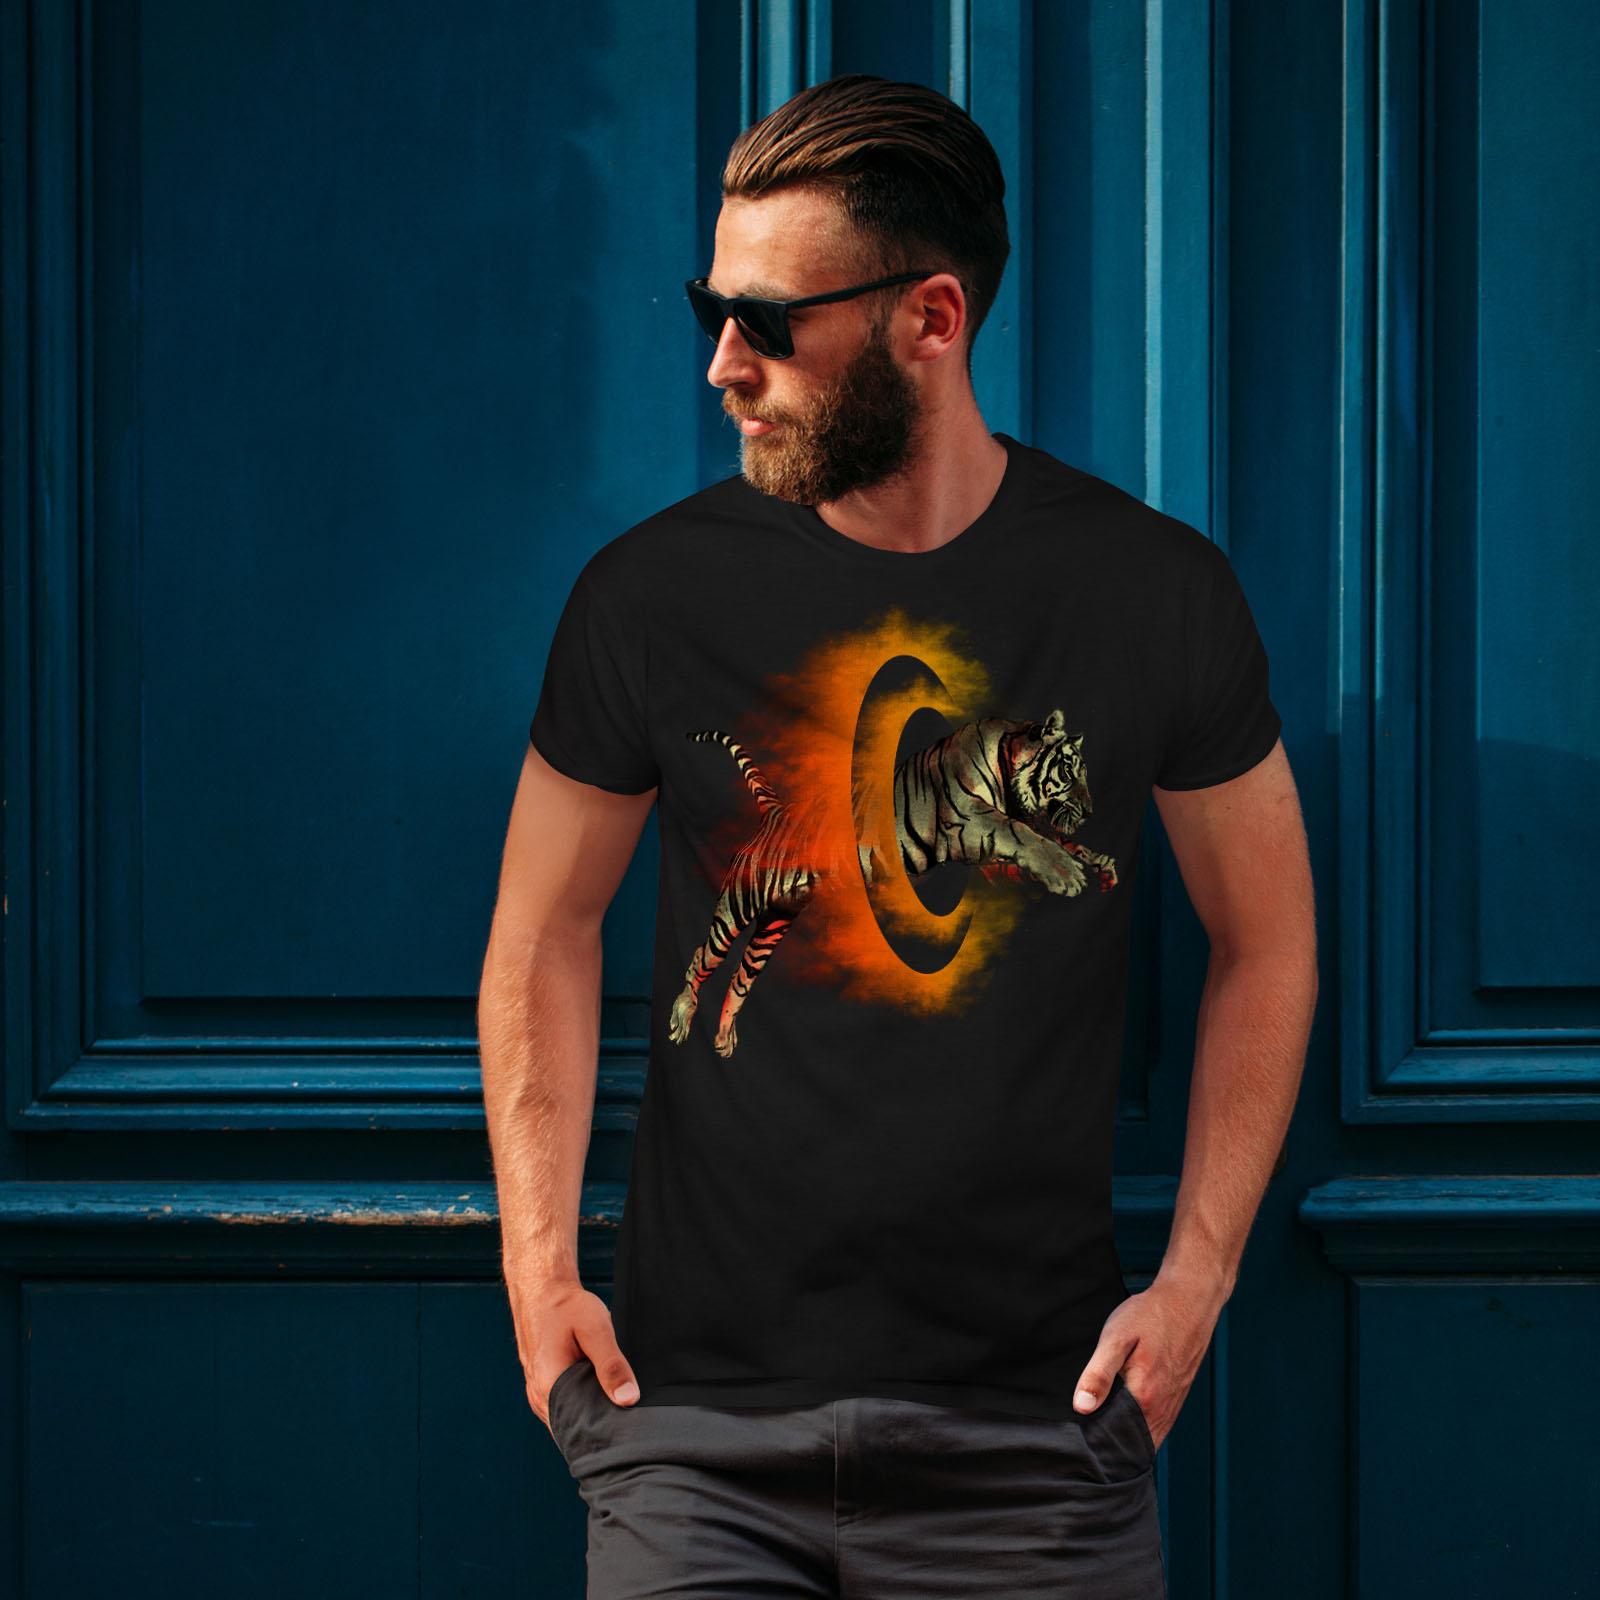 Wellcoda-Tiger-Portal-Cool-Mens-T-shirt-Flame-Graphic-Design-Printed-Tee thumbnail 4